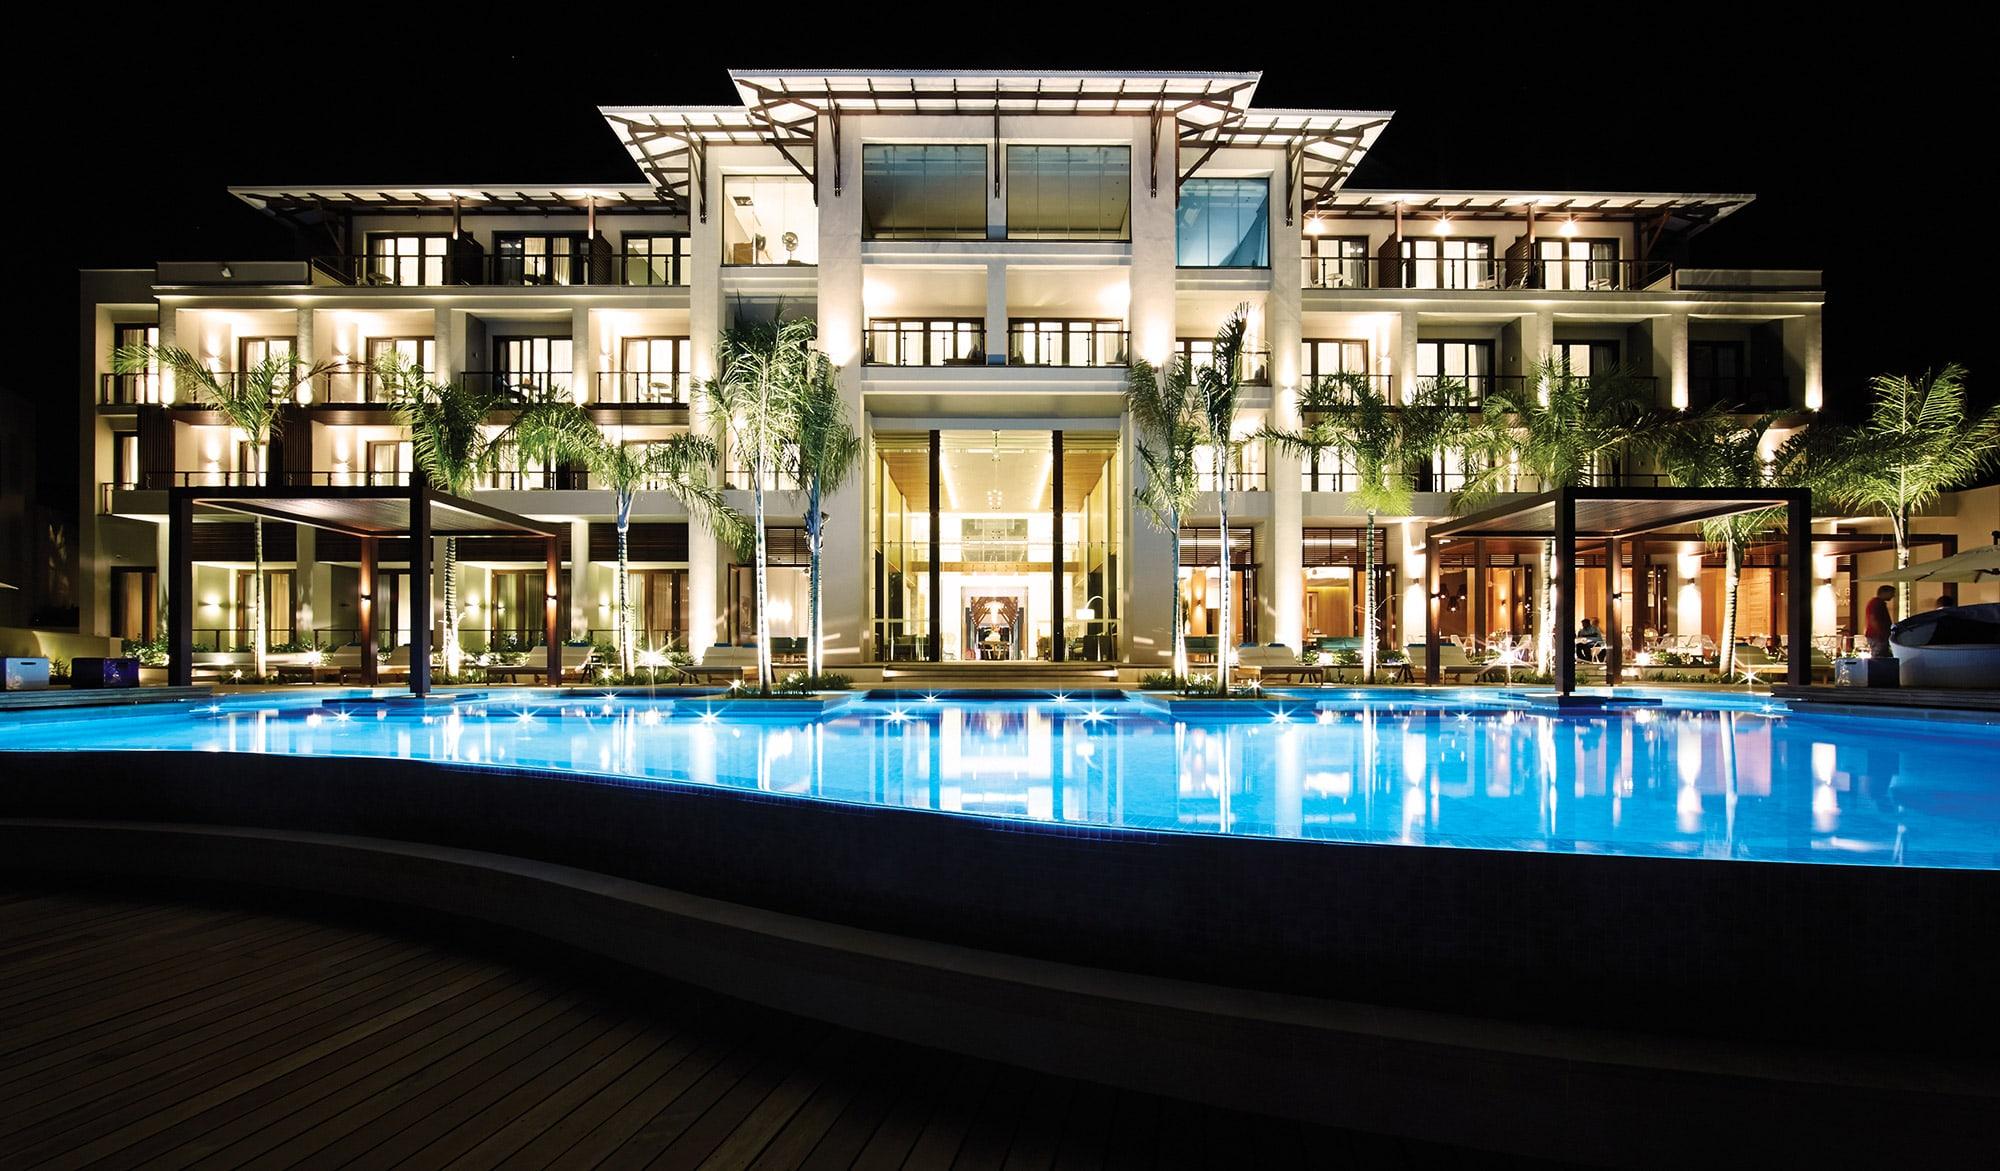 Eden bleu hotel the seychelles - Eden island hotel seychelles ...